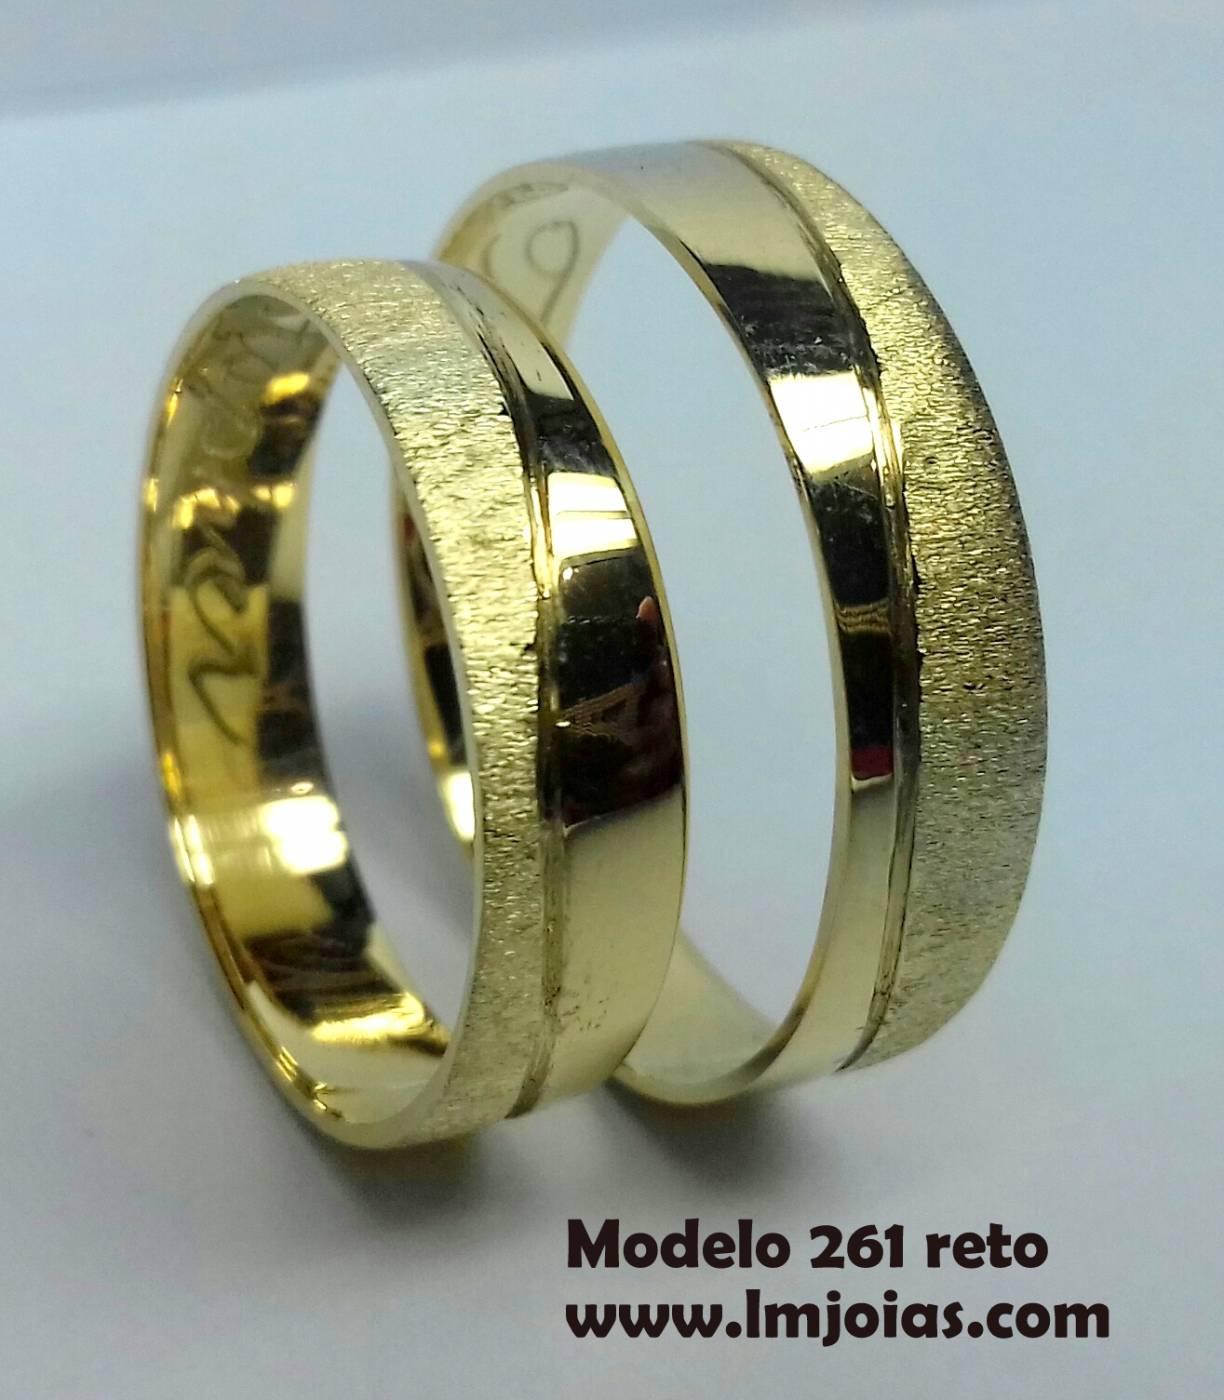 Modelo 261 Reto